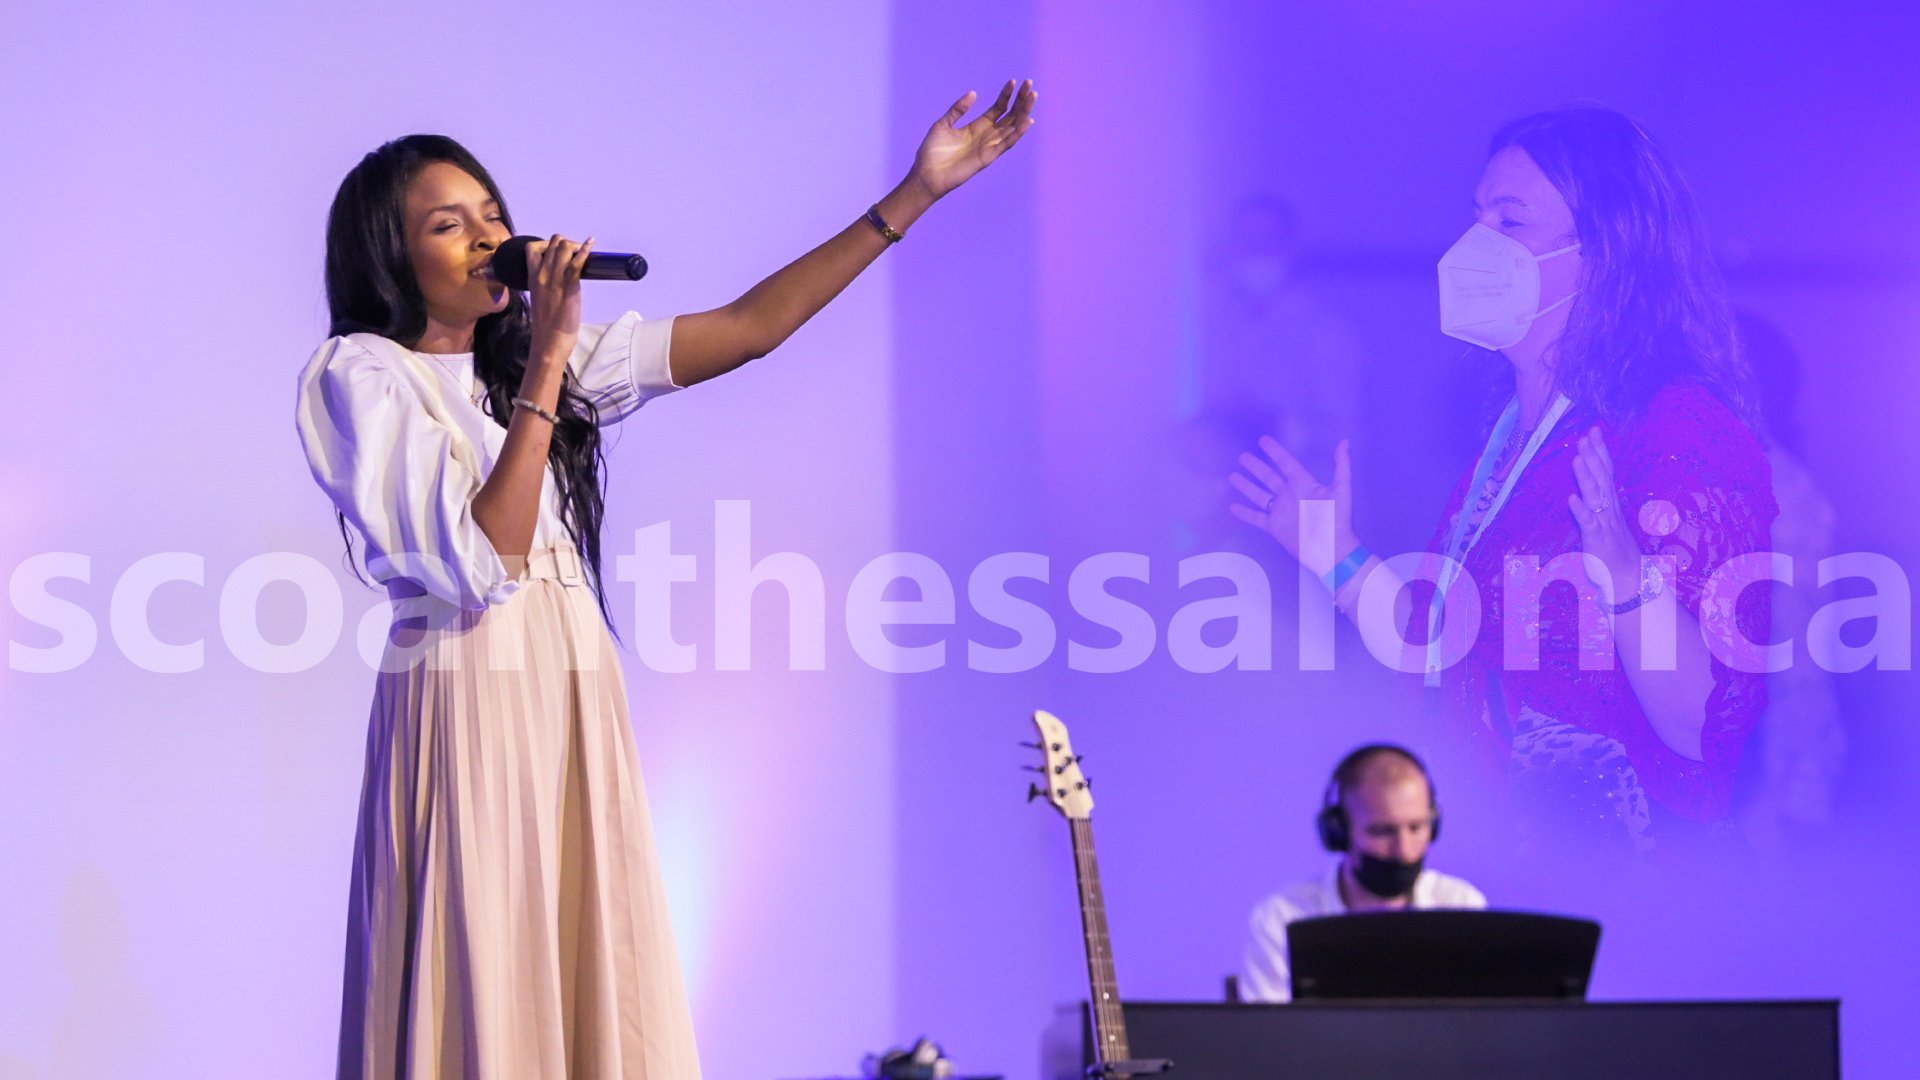 SCOAN_THESSALONICA_WORSHIP_2021_09_19